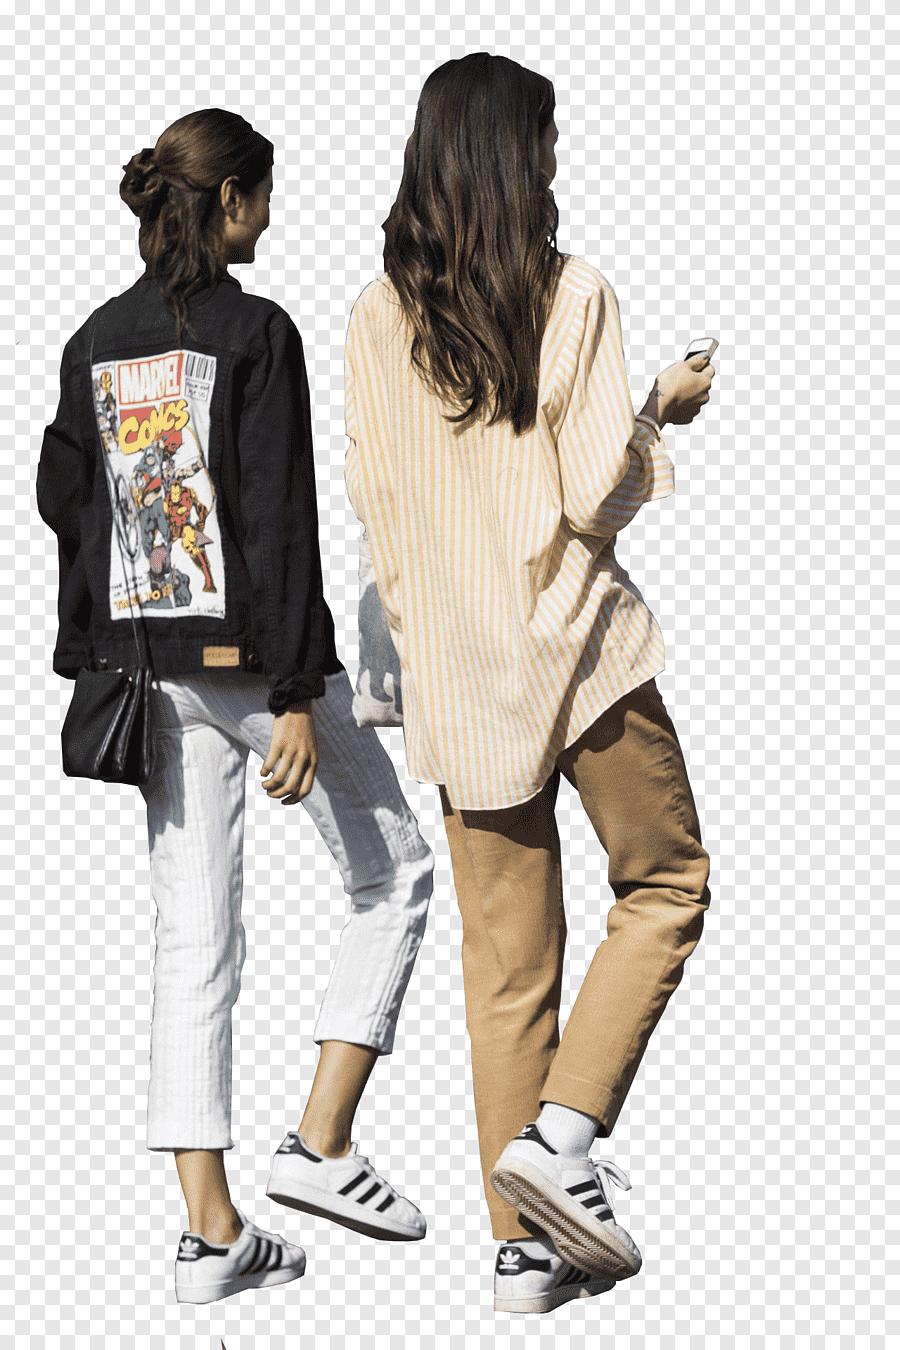 Two Woman Walking Walking Rendering Architecture Sitting Man Miscellaneous Tshirt Png People Png Render People People Walking Png